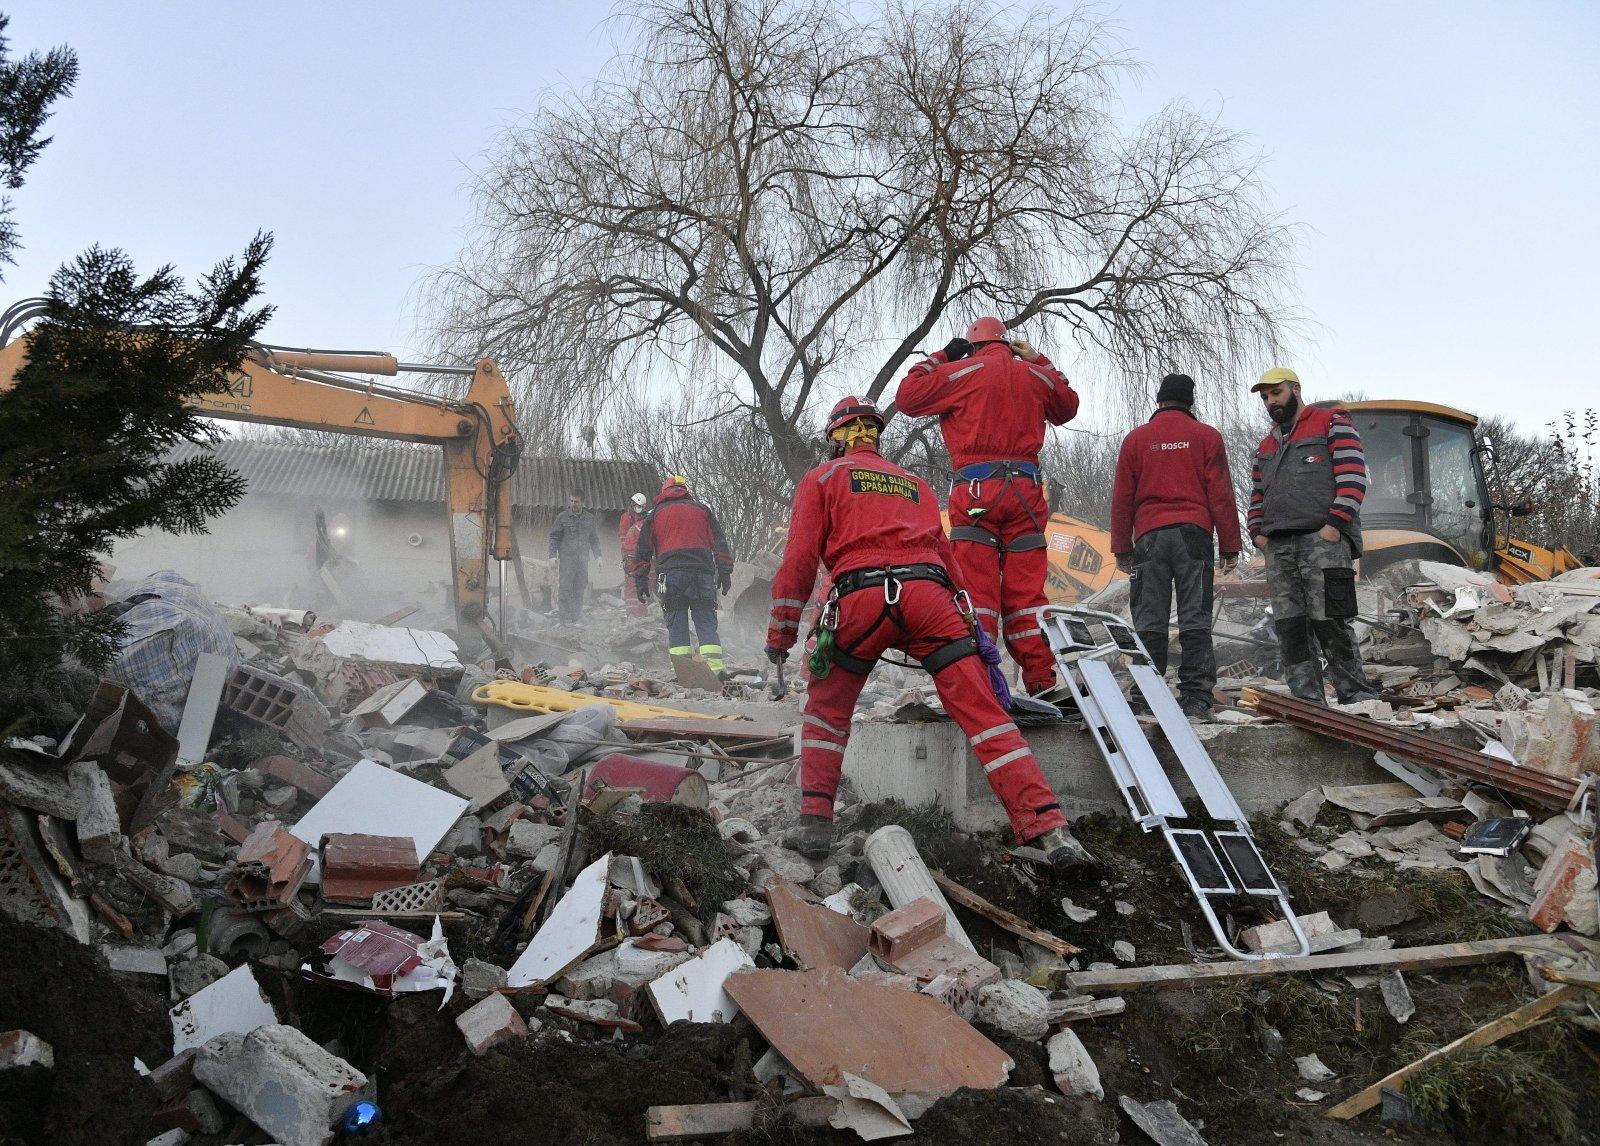 FOTOD | Horvaatia maavärin tappis vähemalt seitse inimest